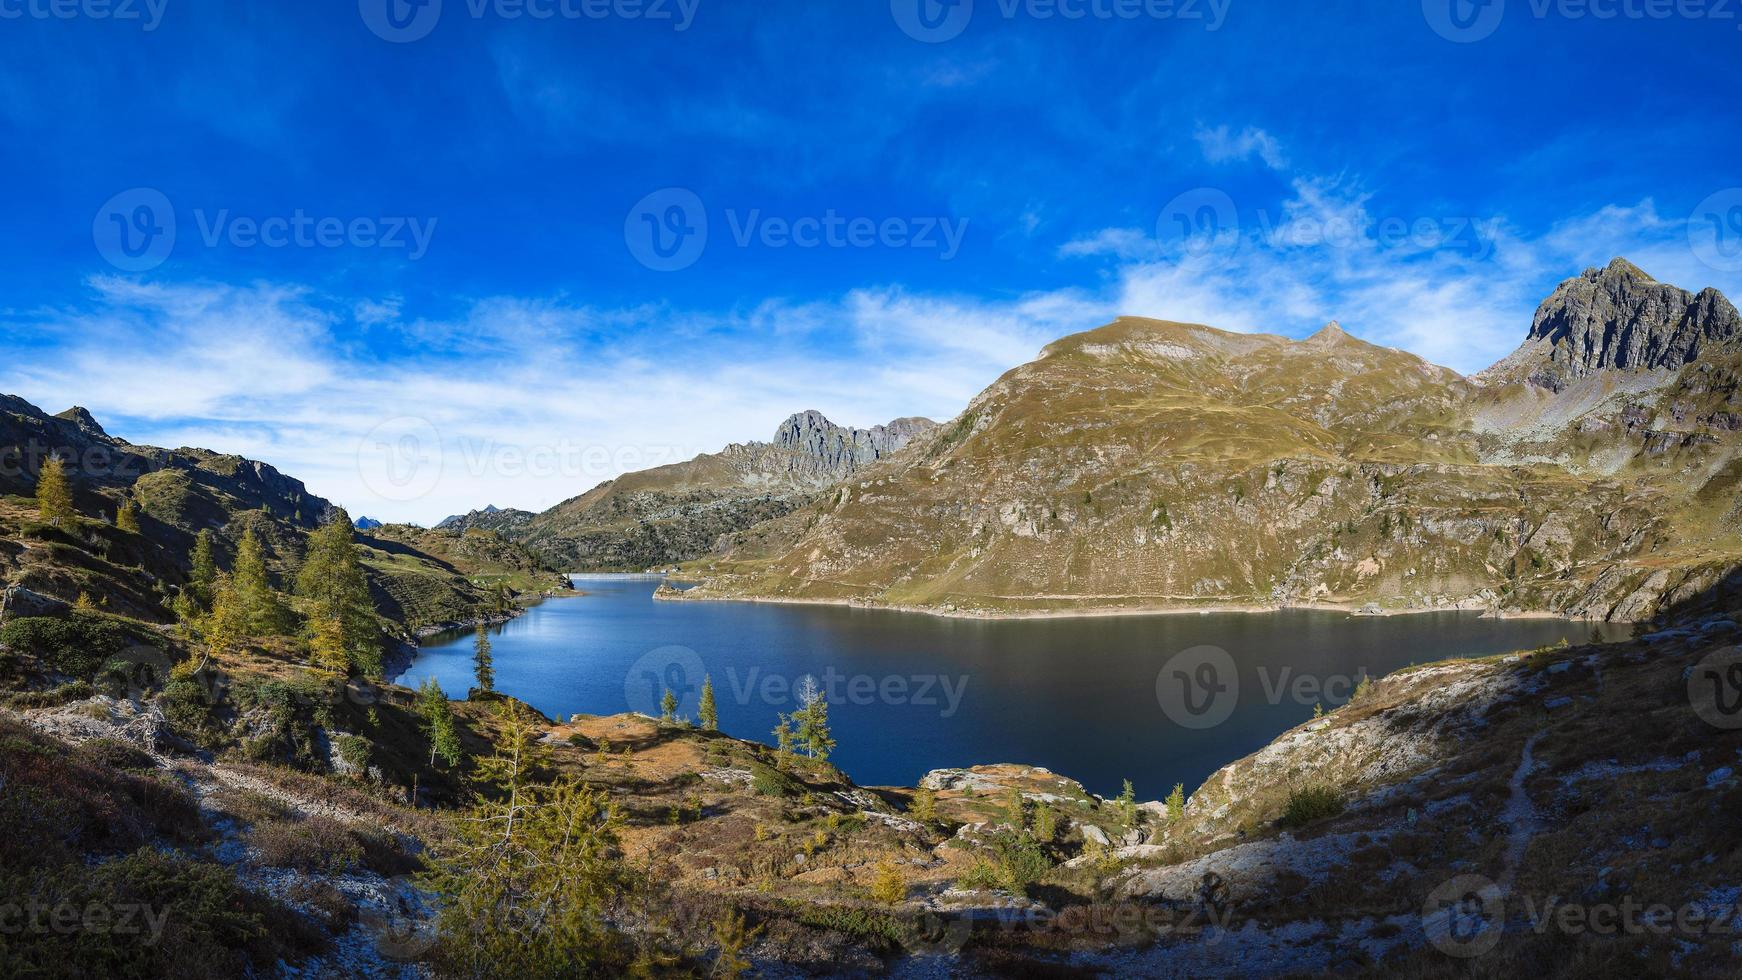 Seen gemelli. Alpensee der Alpen Orobias in Norditalien. foto